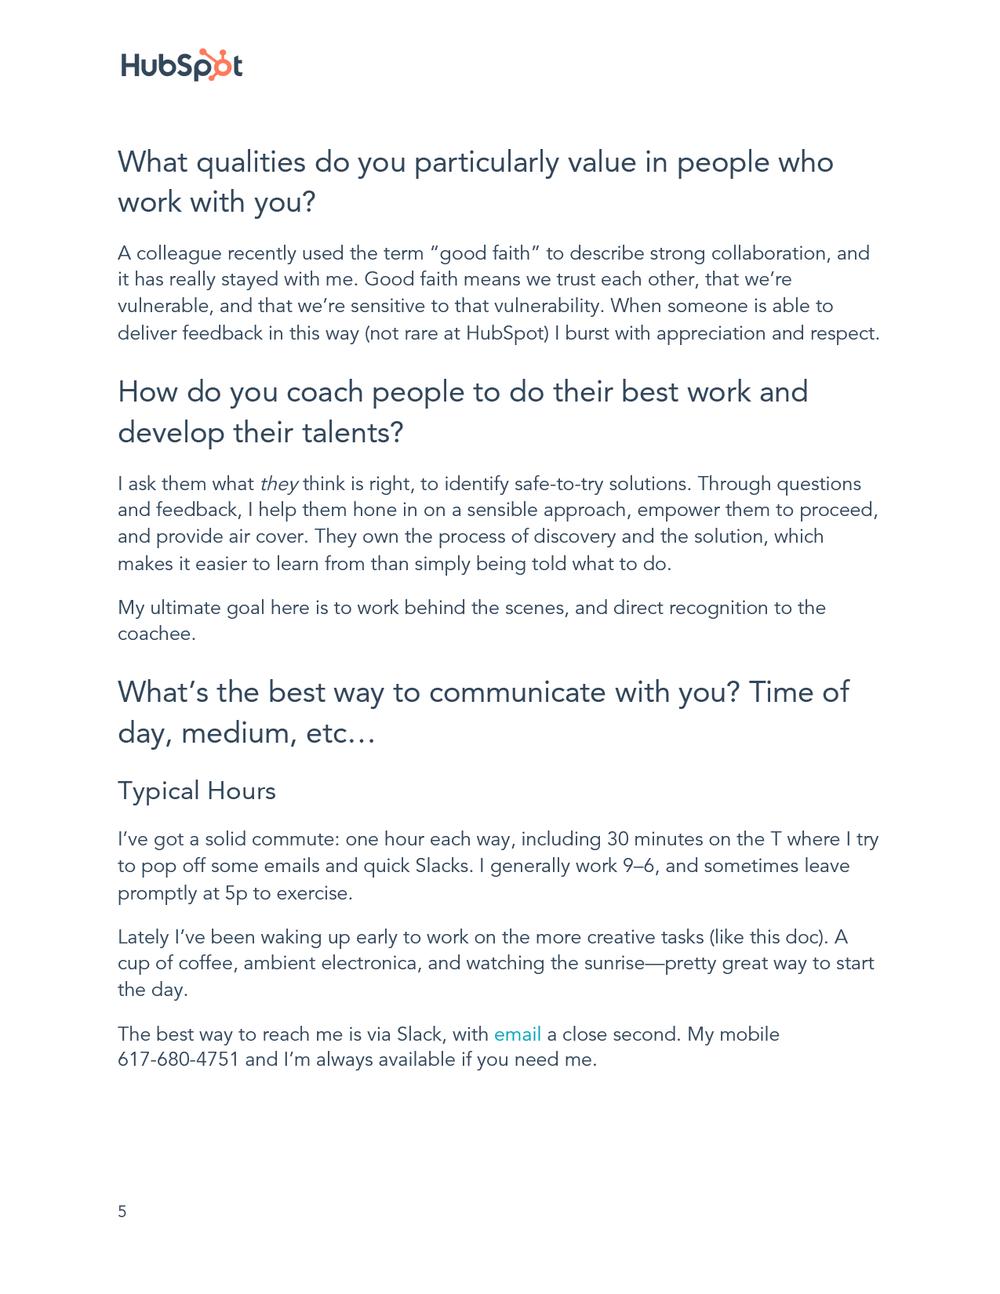 Ben Spear _ Marketing Team User Guide-5.png